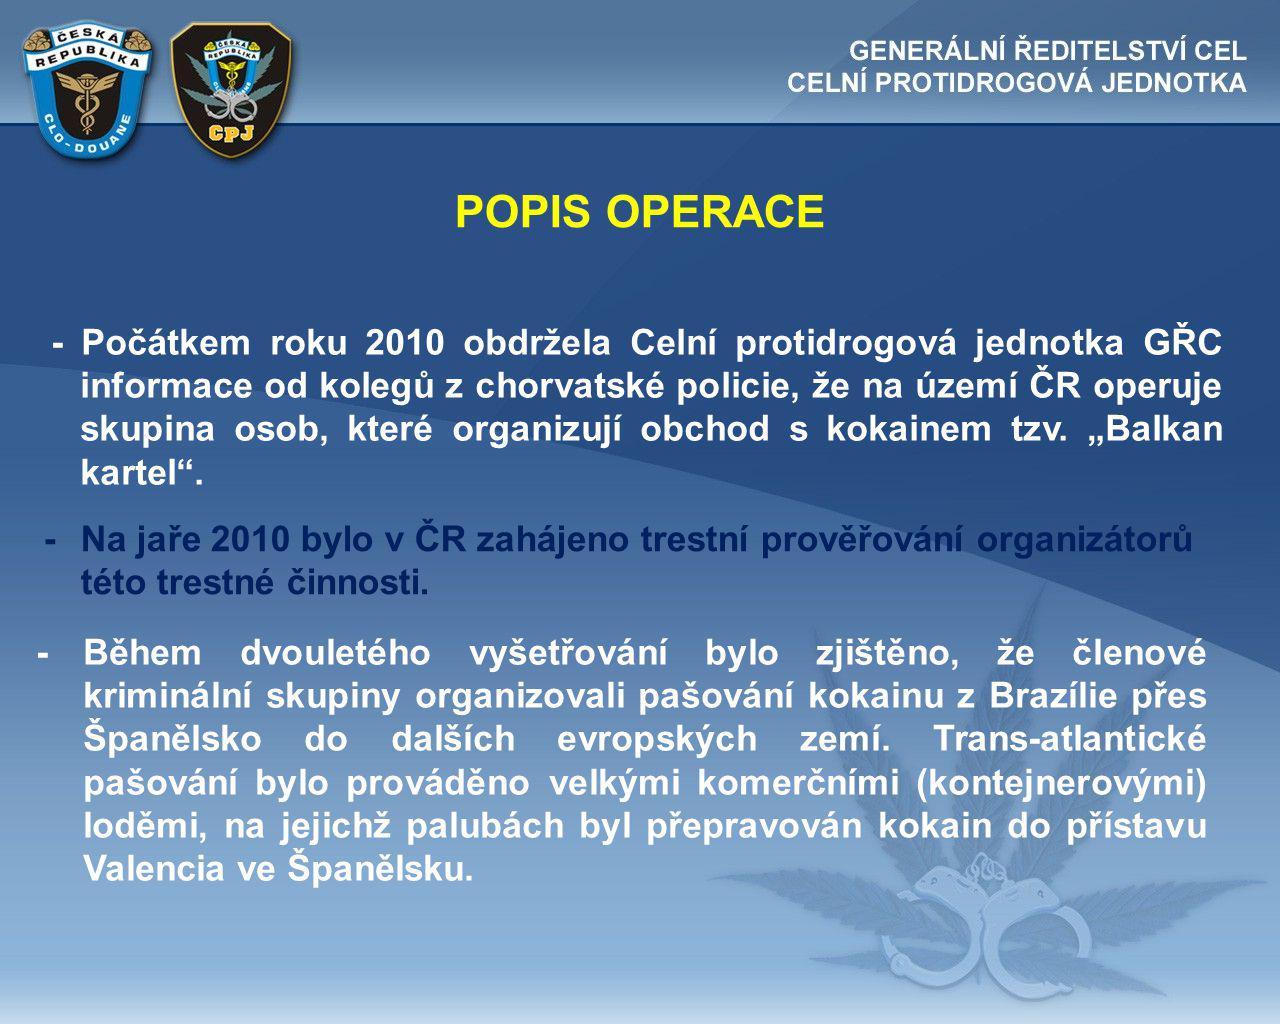 POPIS OPERACE